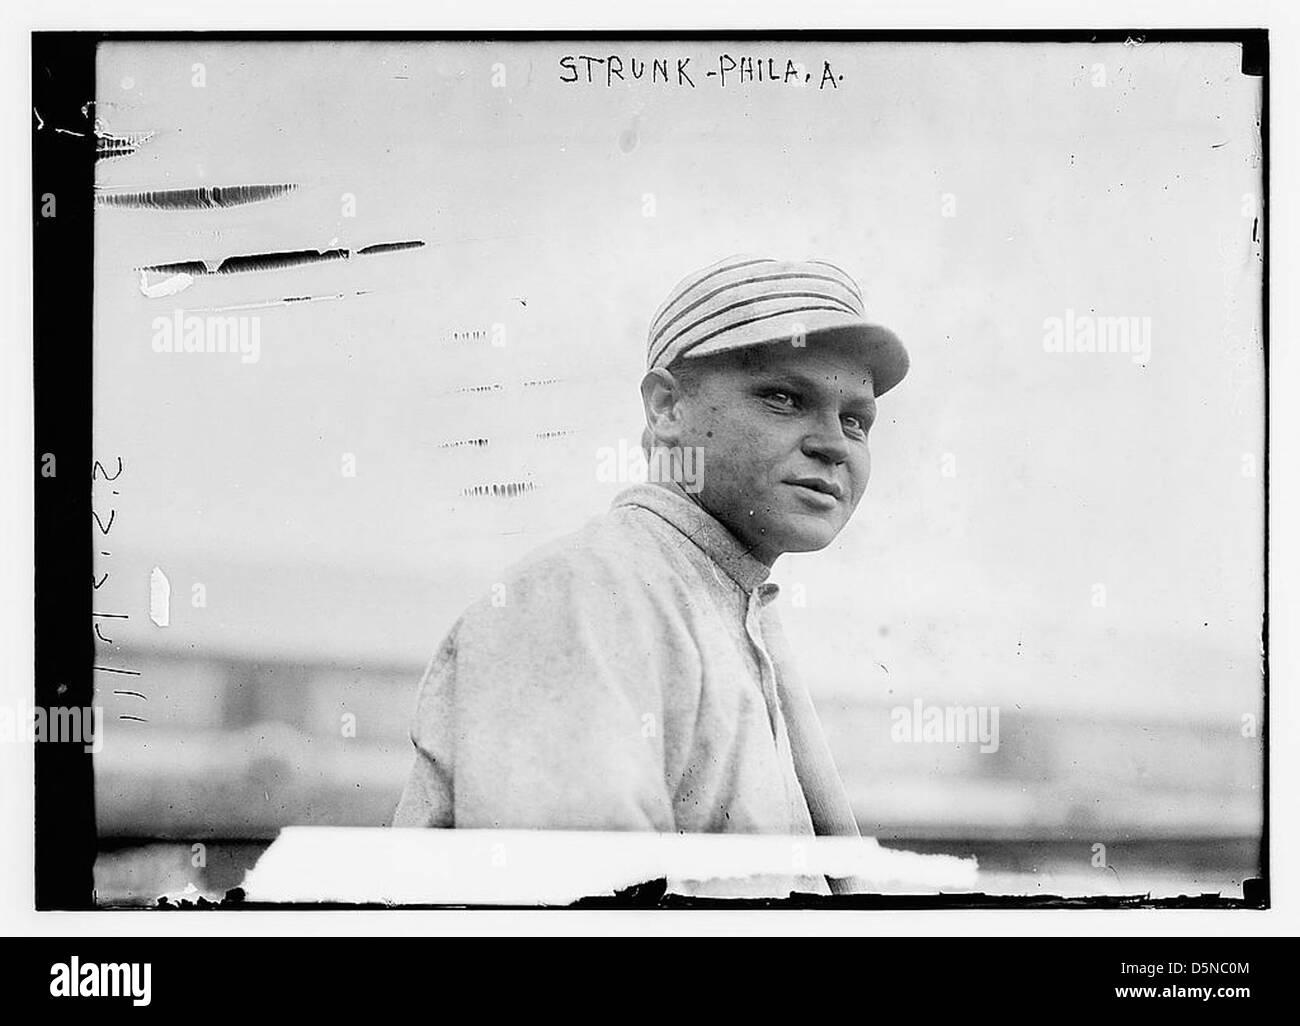 [Amós Strunk, Philadelphia, AL (béisbol)] (LOC) Imagen De Stock